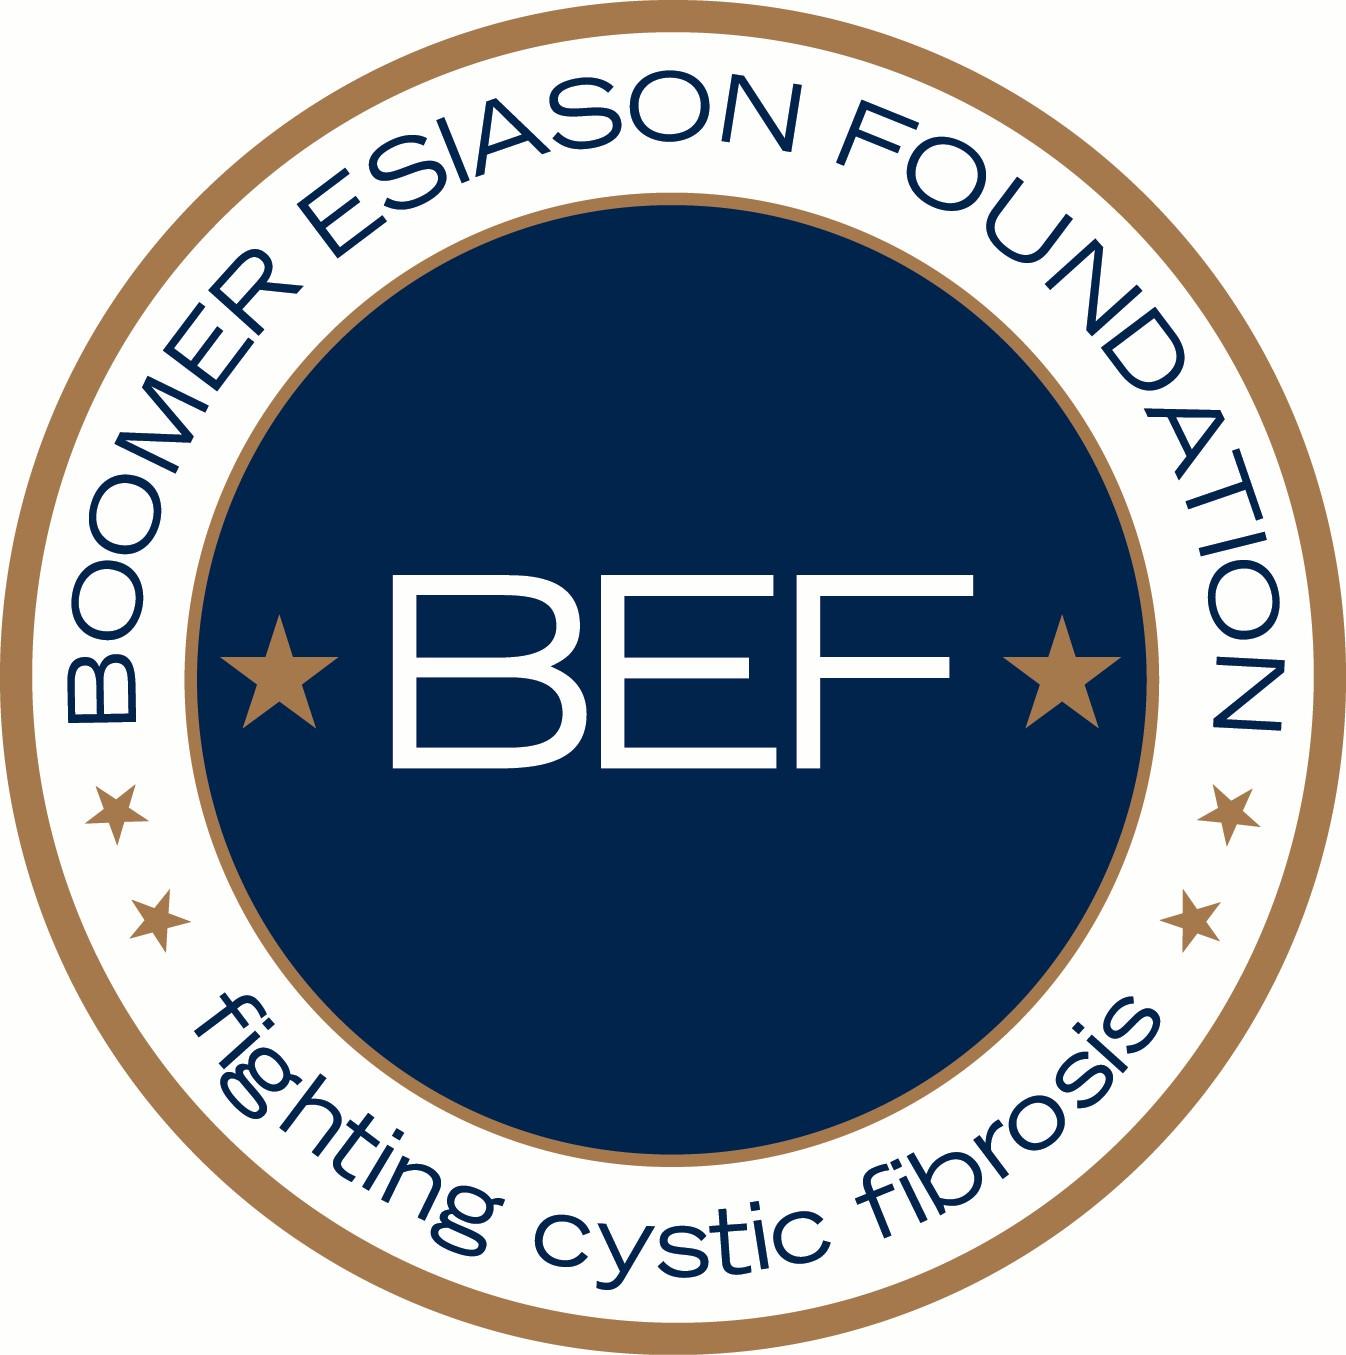 The Boomer Esiason Foundation